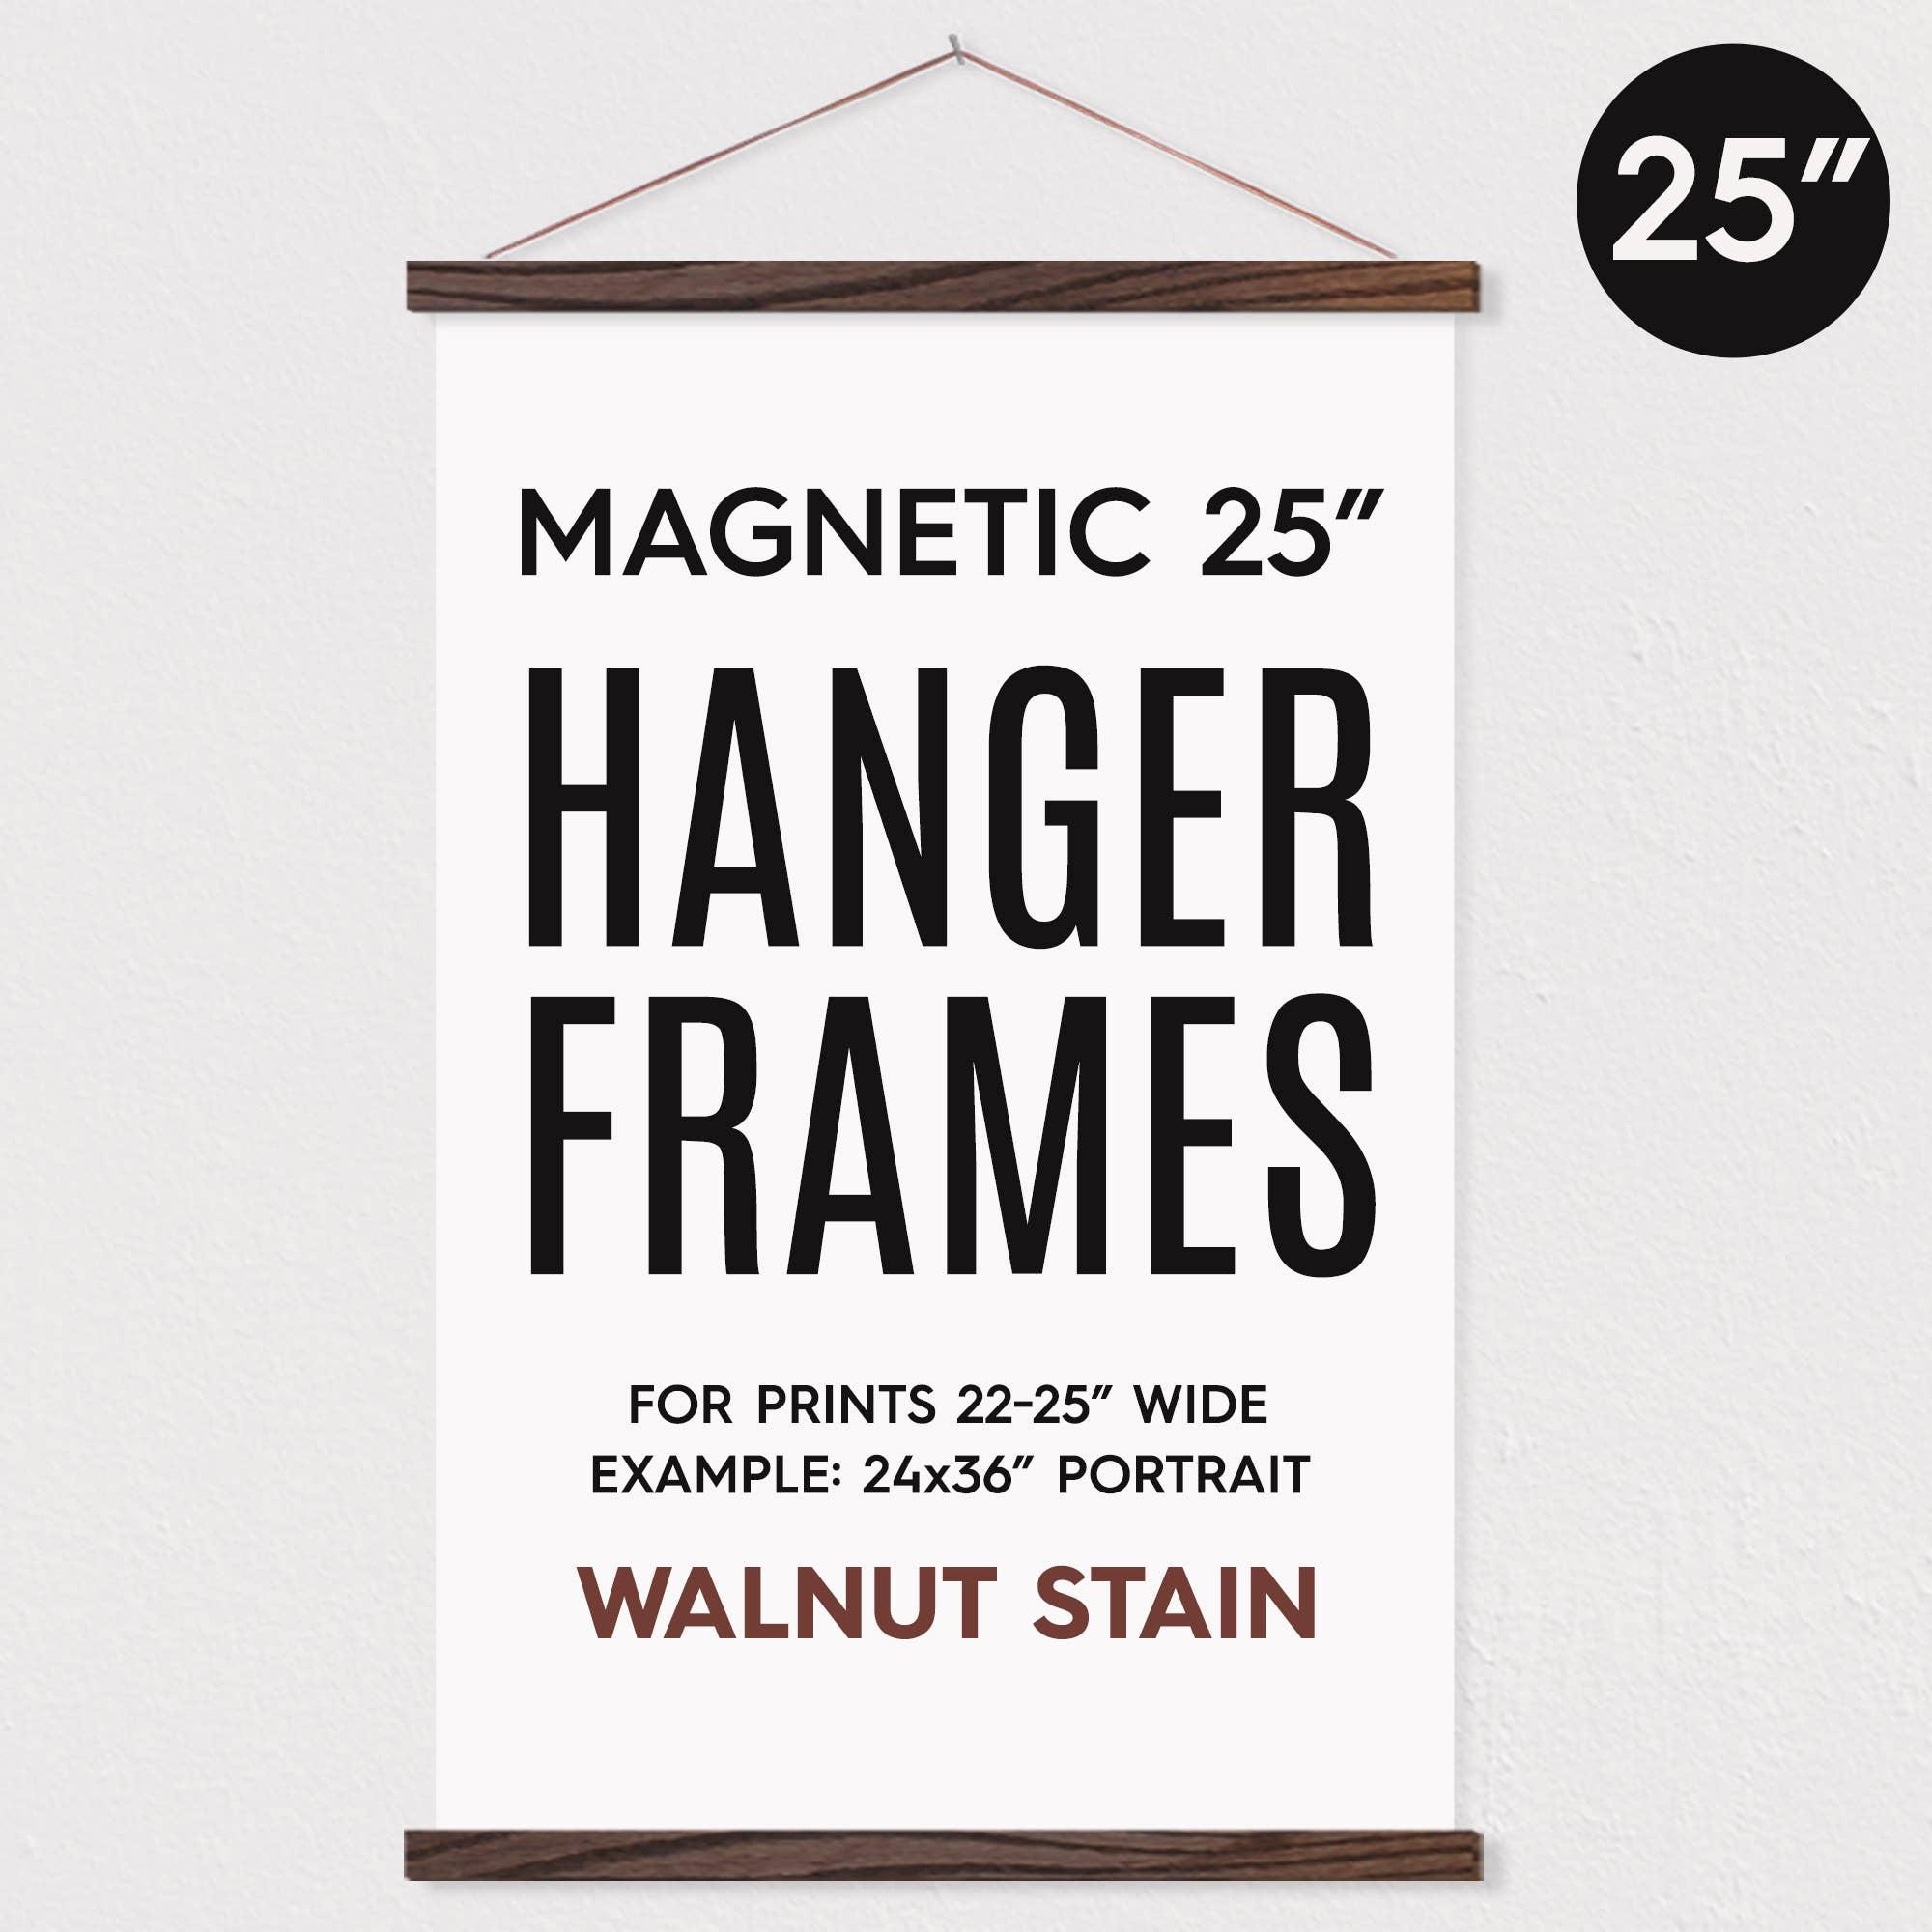 "25"" MAGNETIC Poster Hanger Frame for 24x36"" Portrait Print   Trada Marketplace"